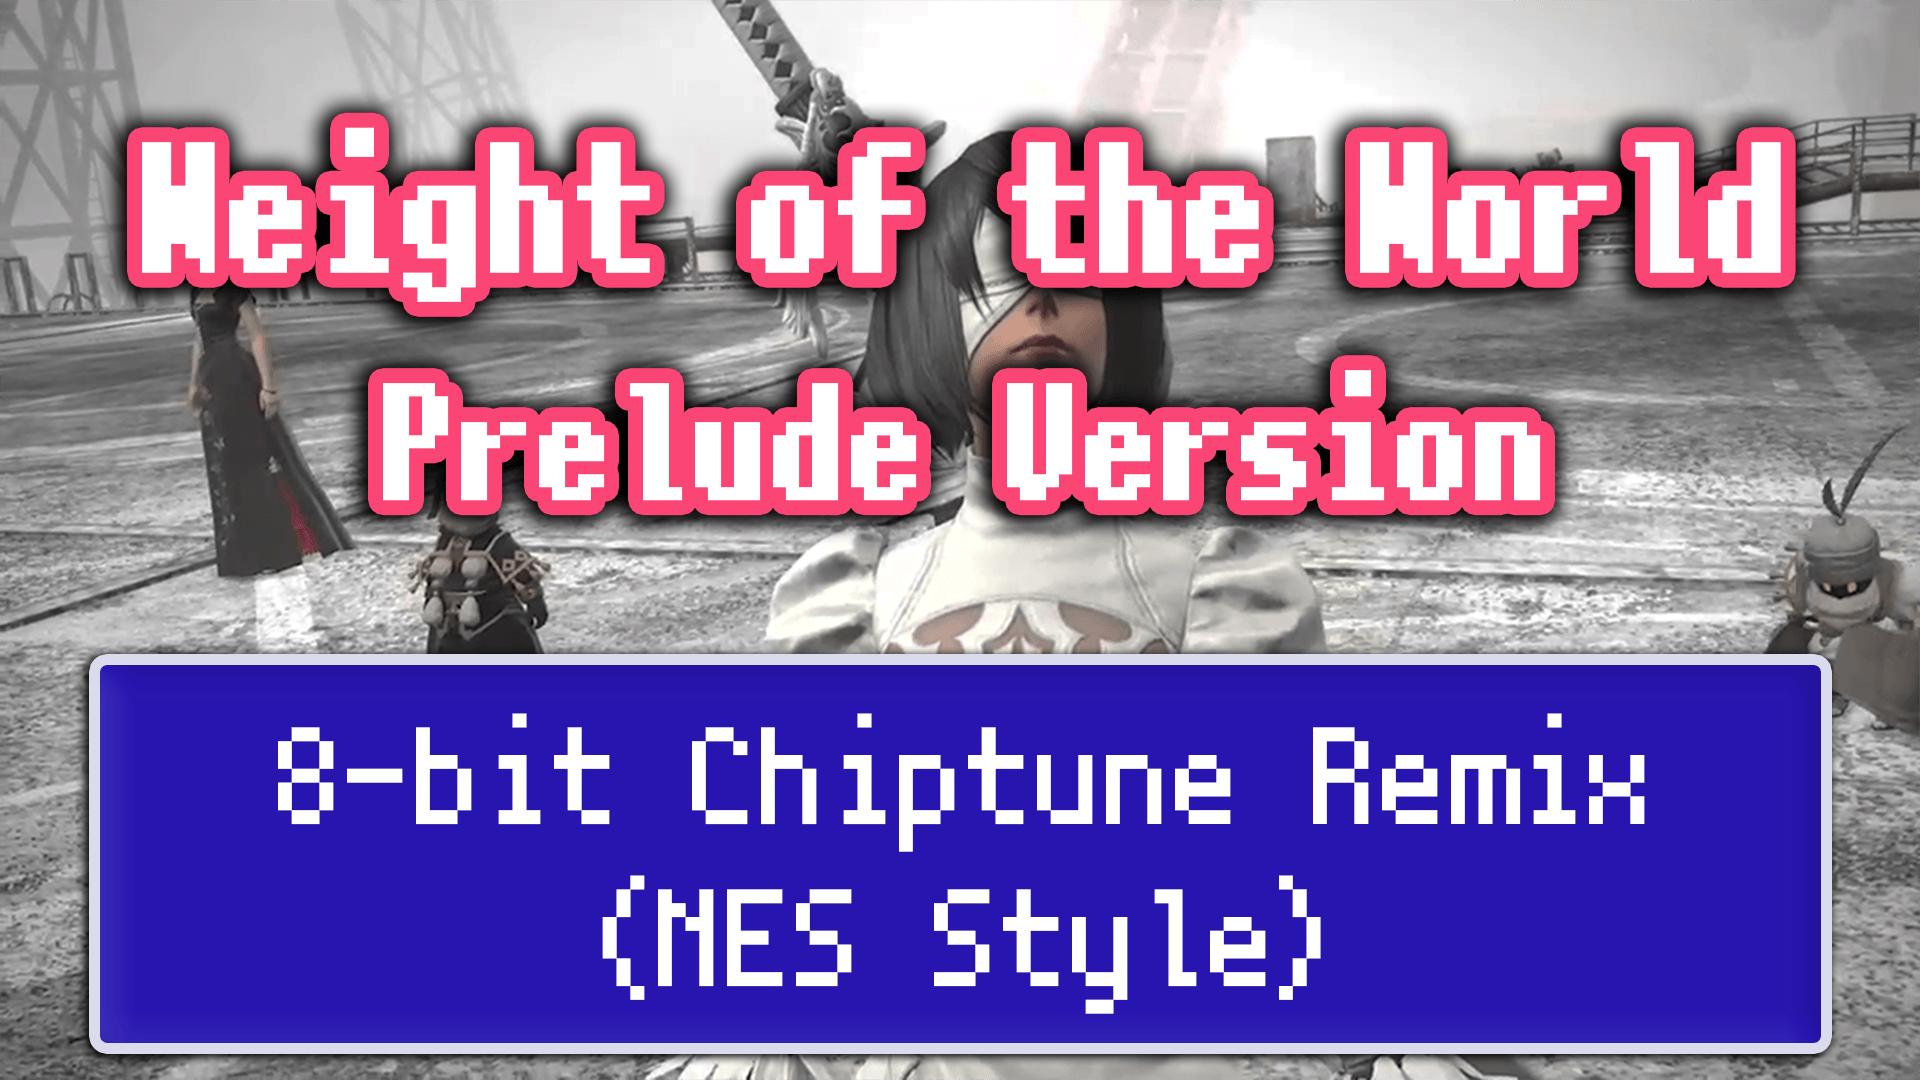 "【FF14】""Weight of the World - Prelude Version"" ファミコン風8bitアレンジ【ゲーム音楽カバー】"